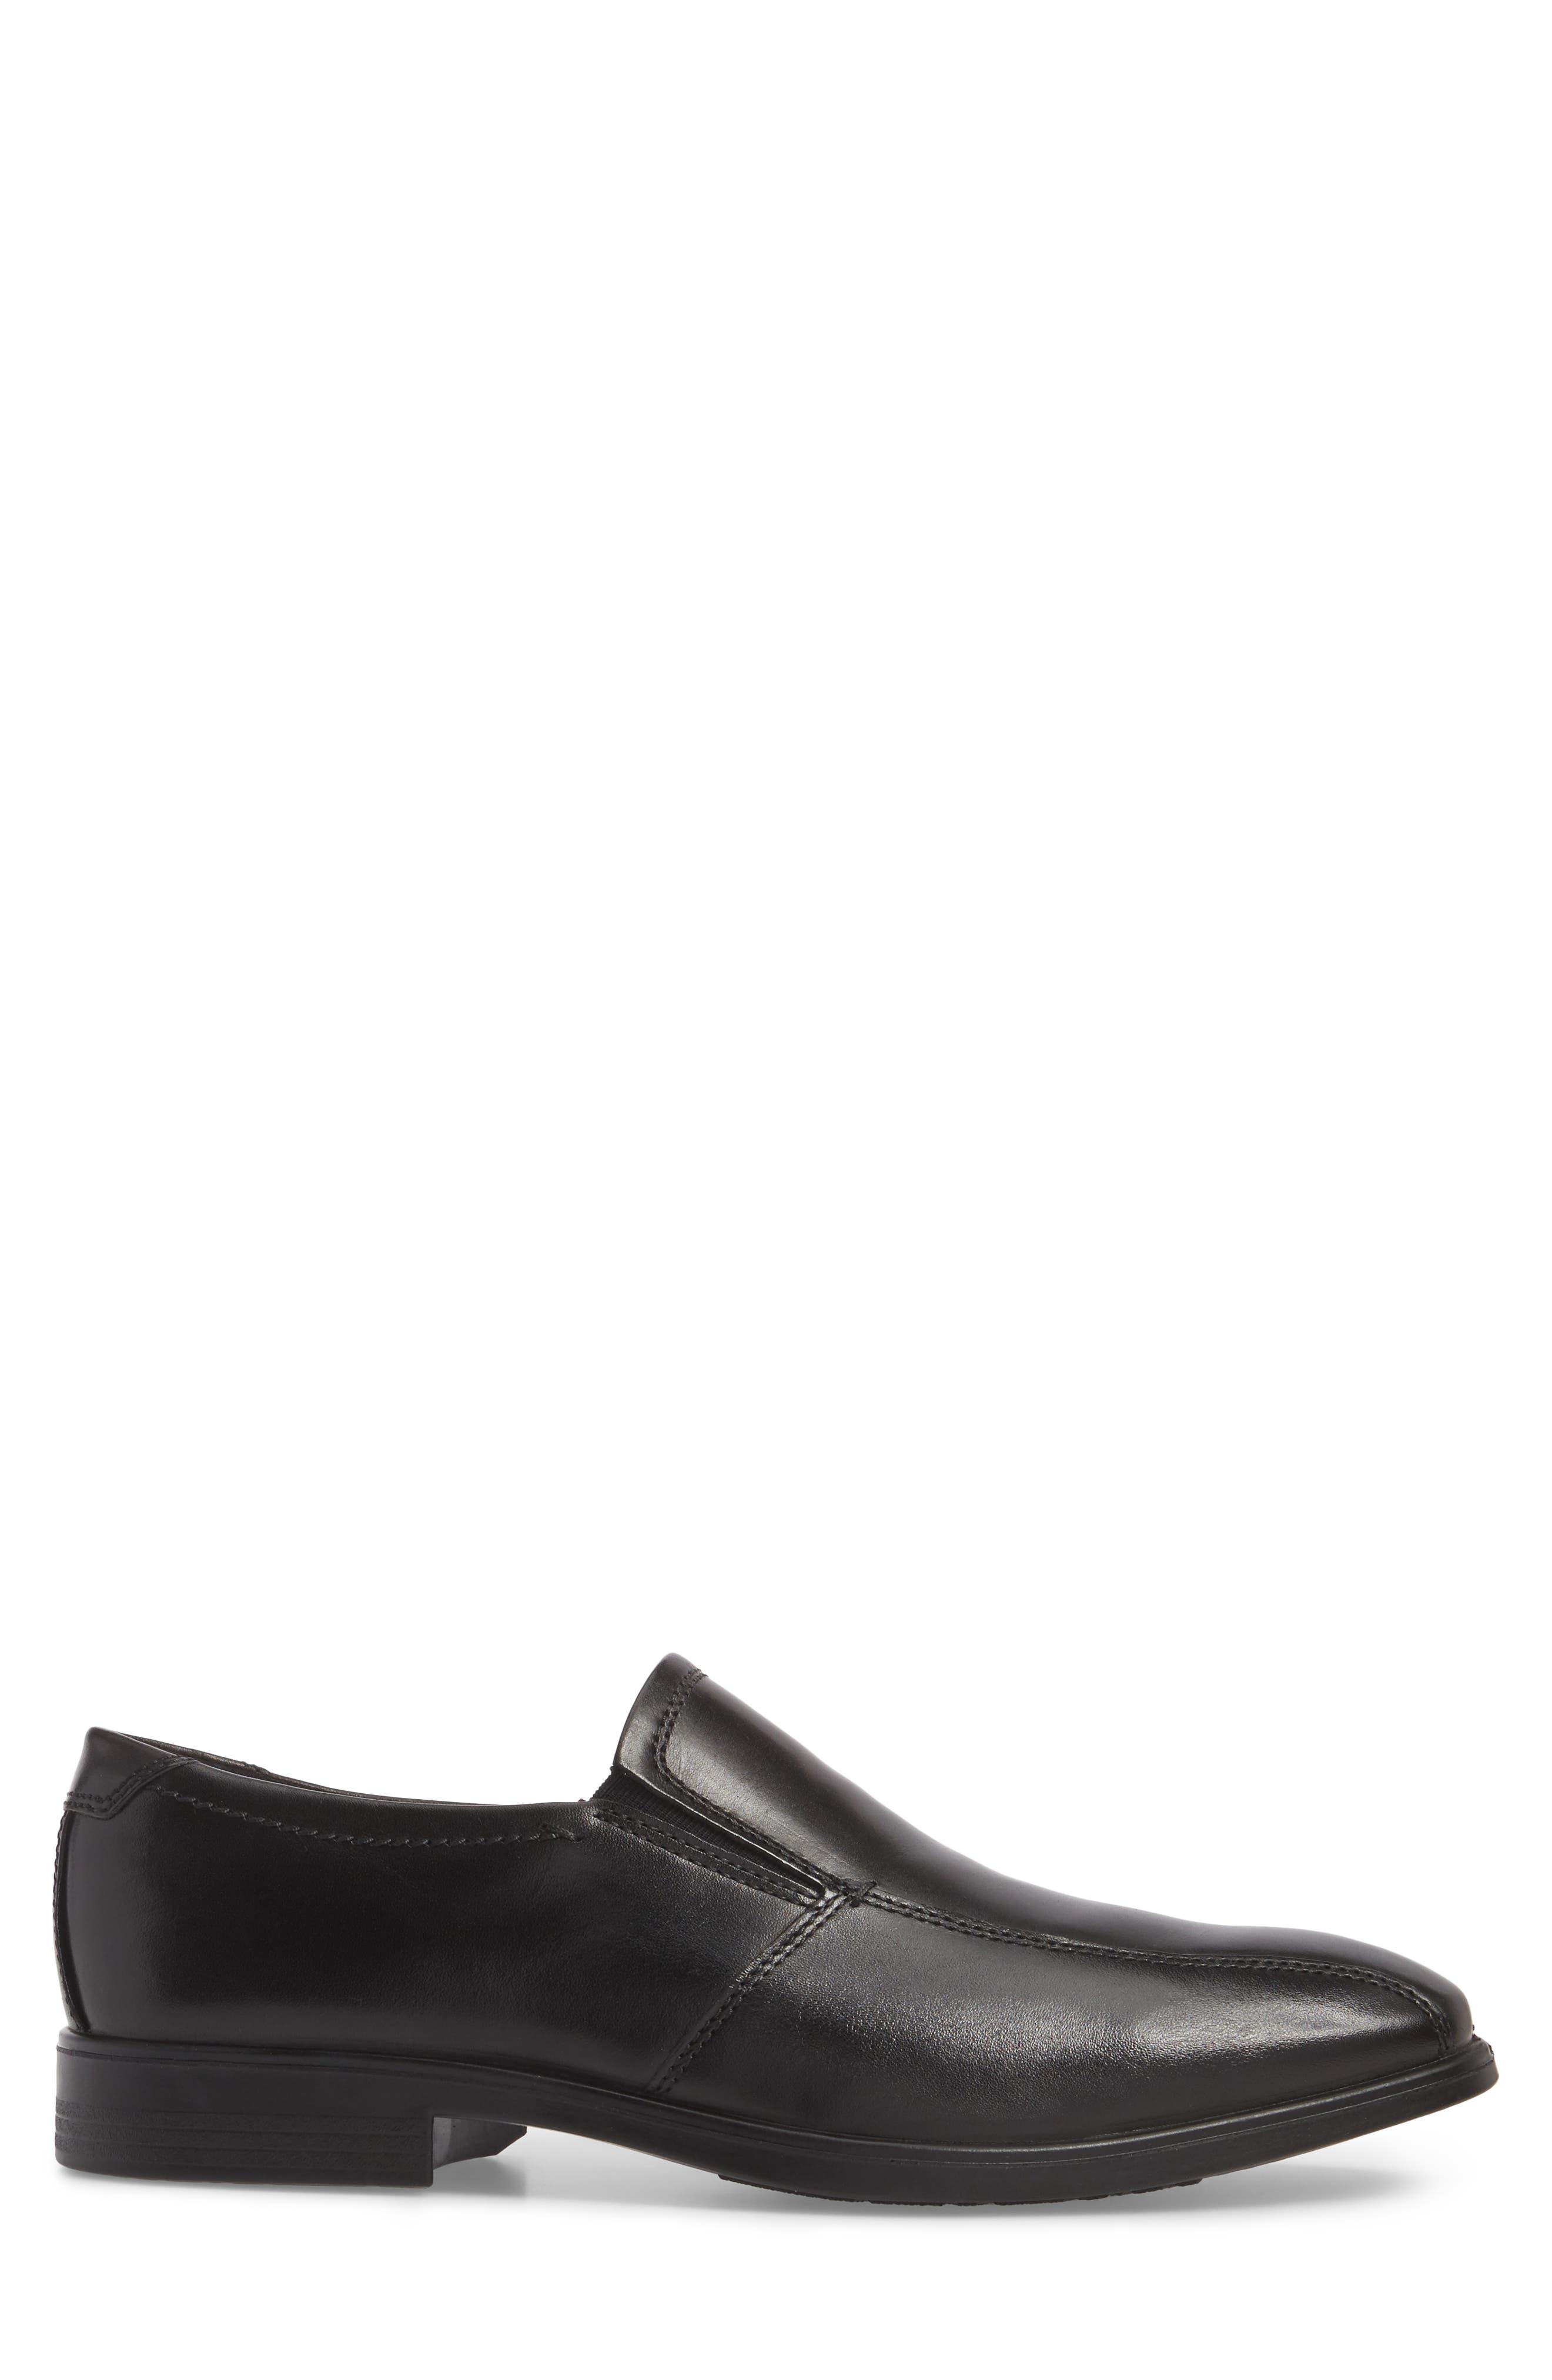 Melbourne Venetian Loafer,                             Alternate thumbnail 3, color,                             BLACK LEATHER